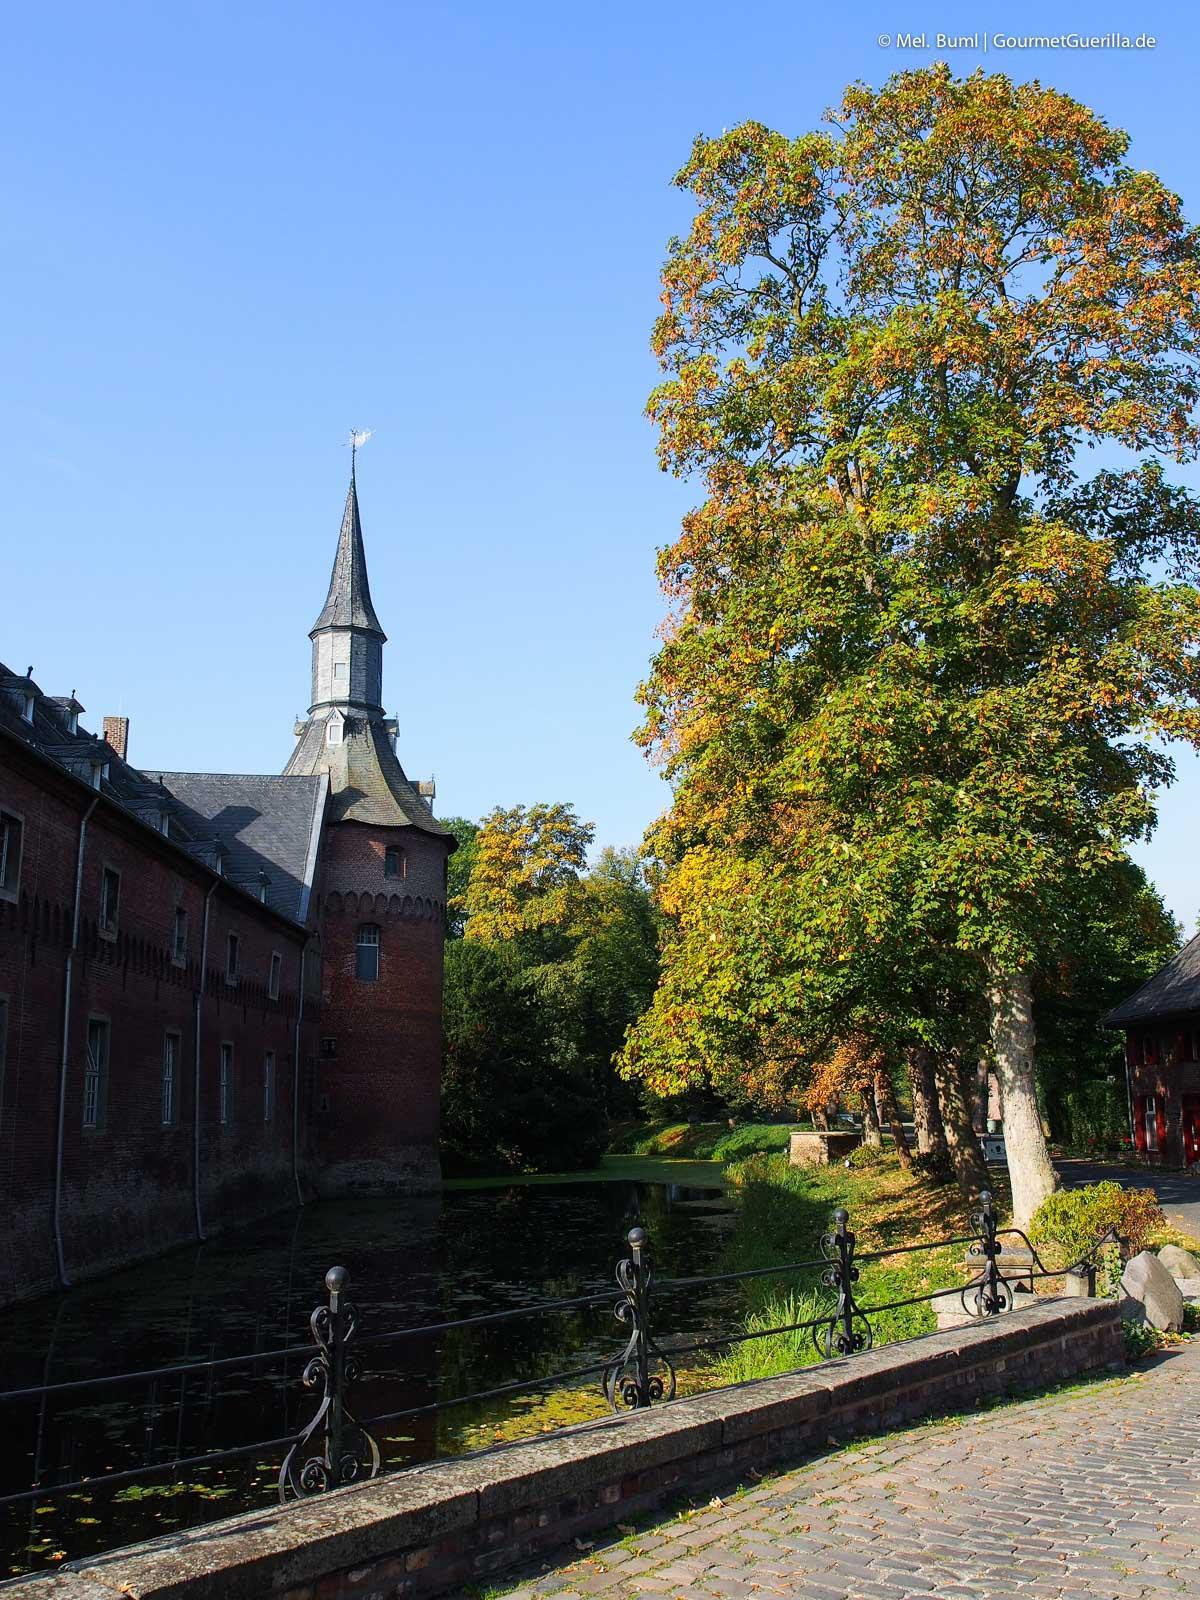 Schloss Wissen am Niederrhein |GourmetGuerilla.de